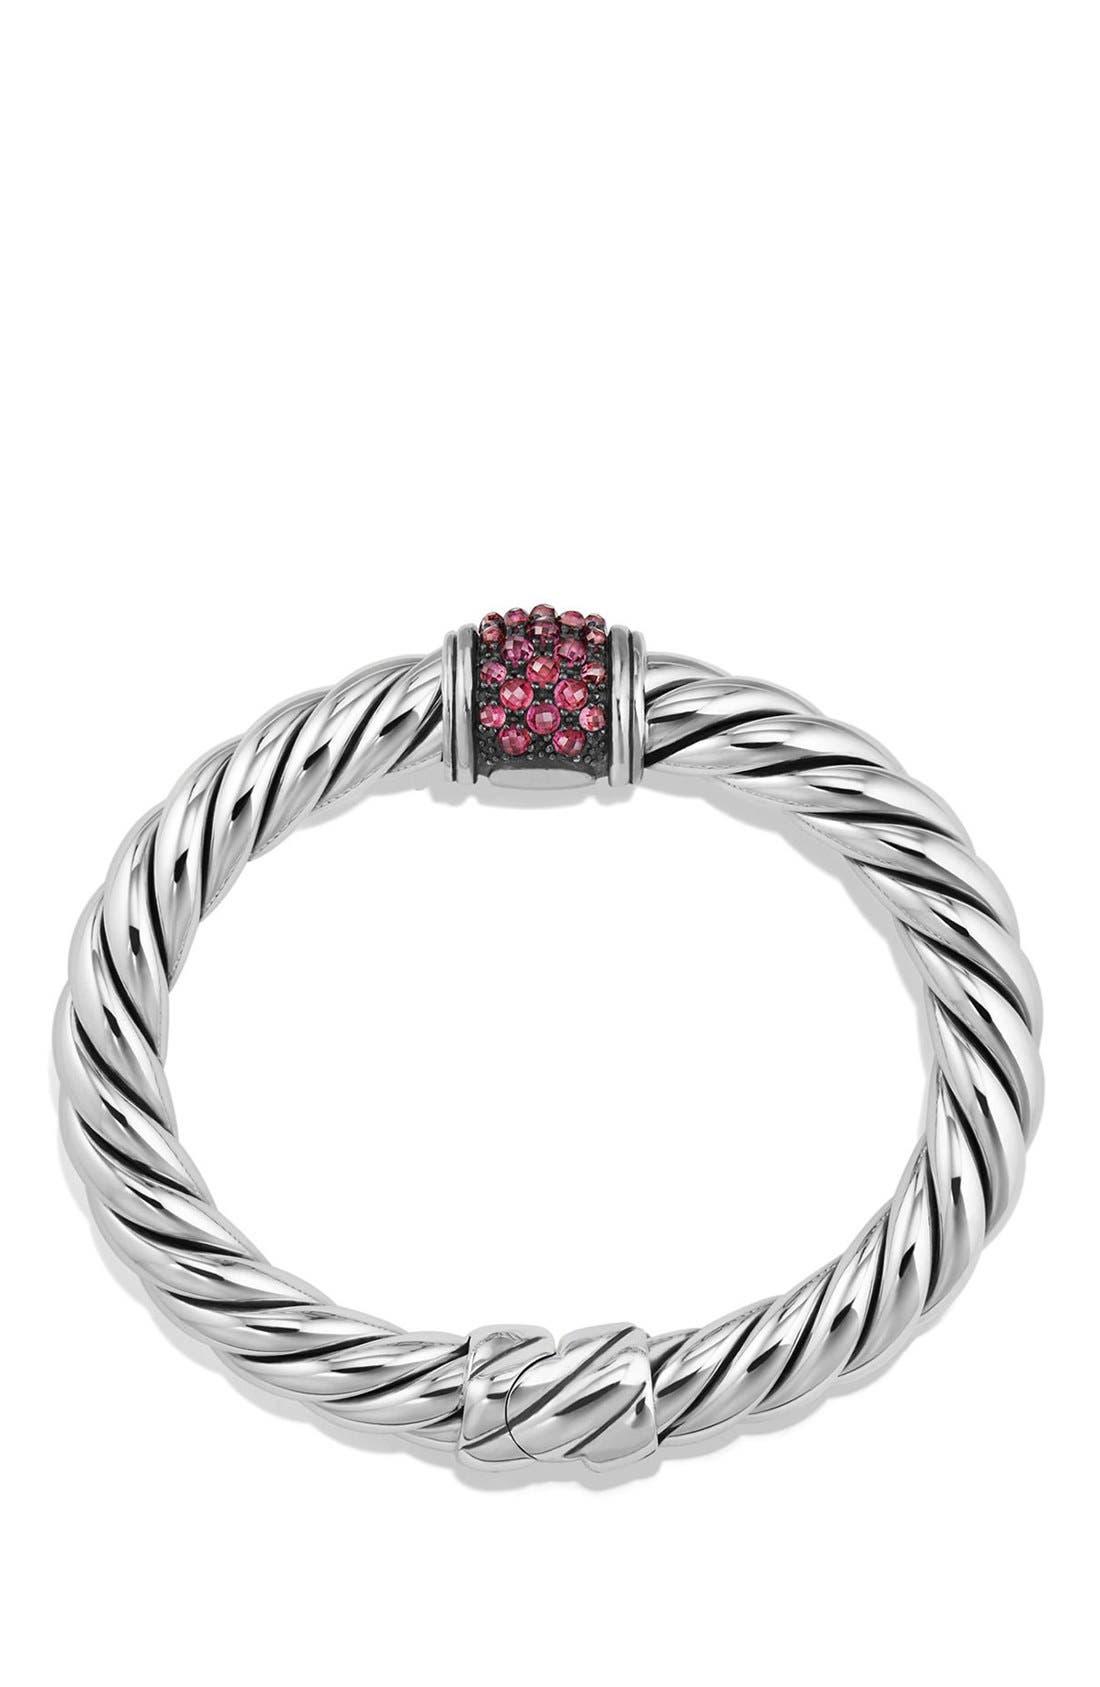 Osetra Hinge Bracelet,                             Alternate thumbnail 2, color,                             Silver